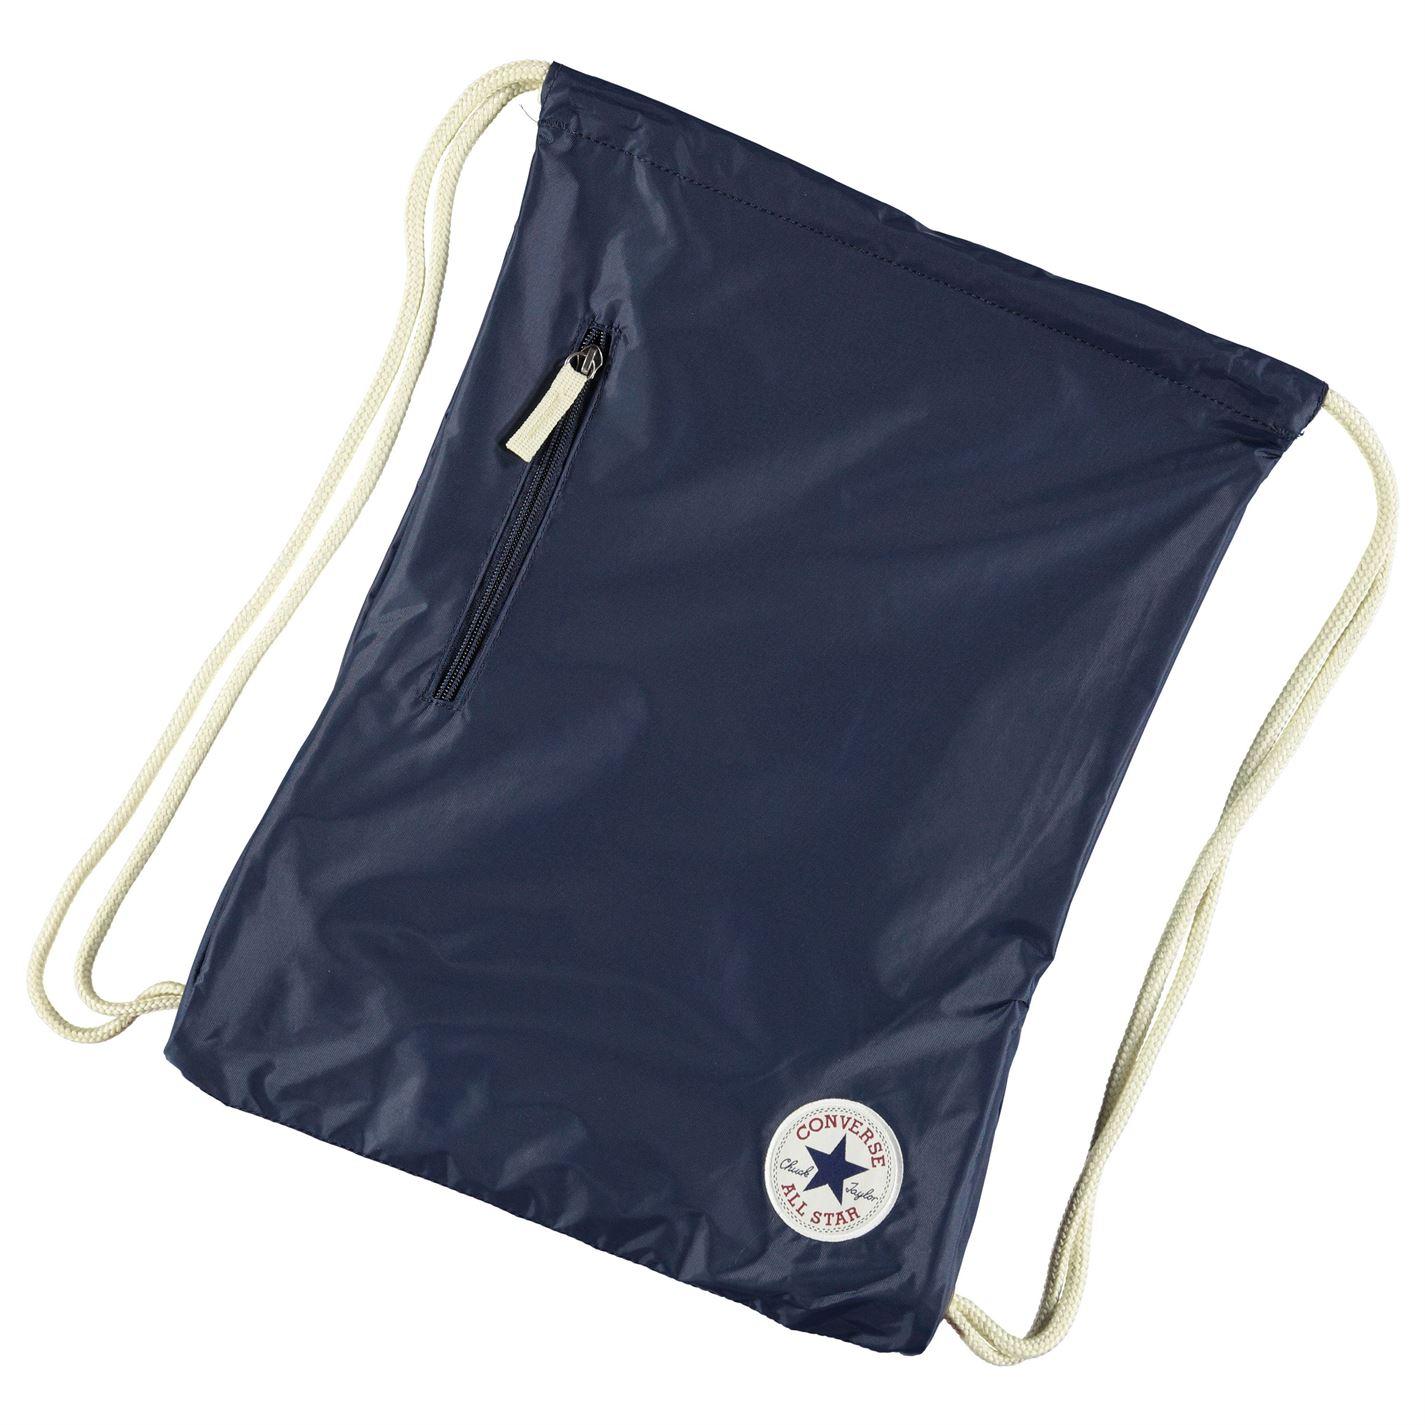 Converse Cinch Gym Bag